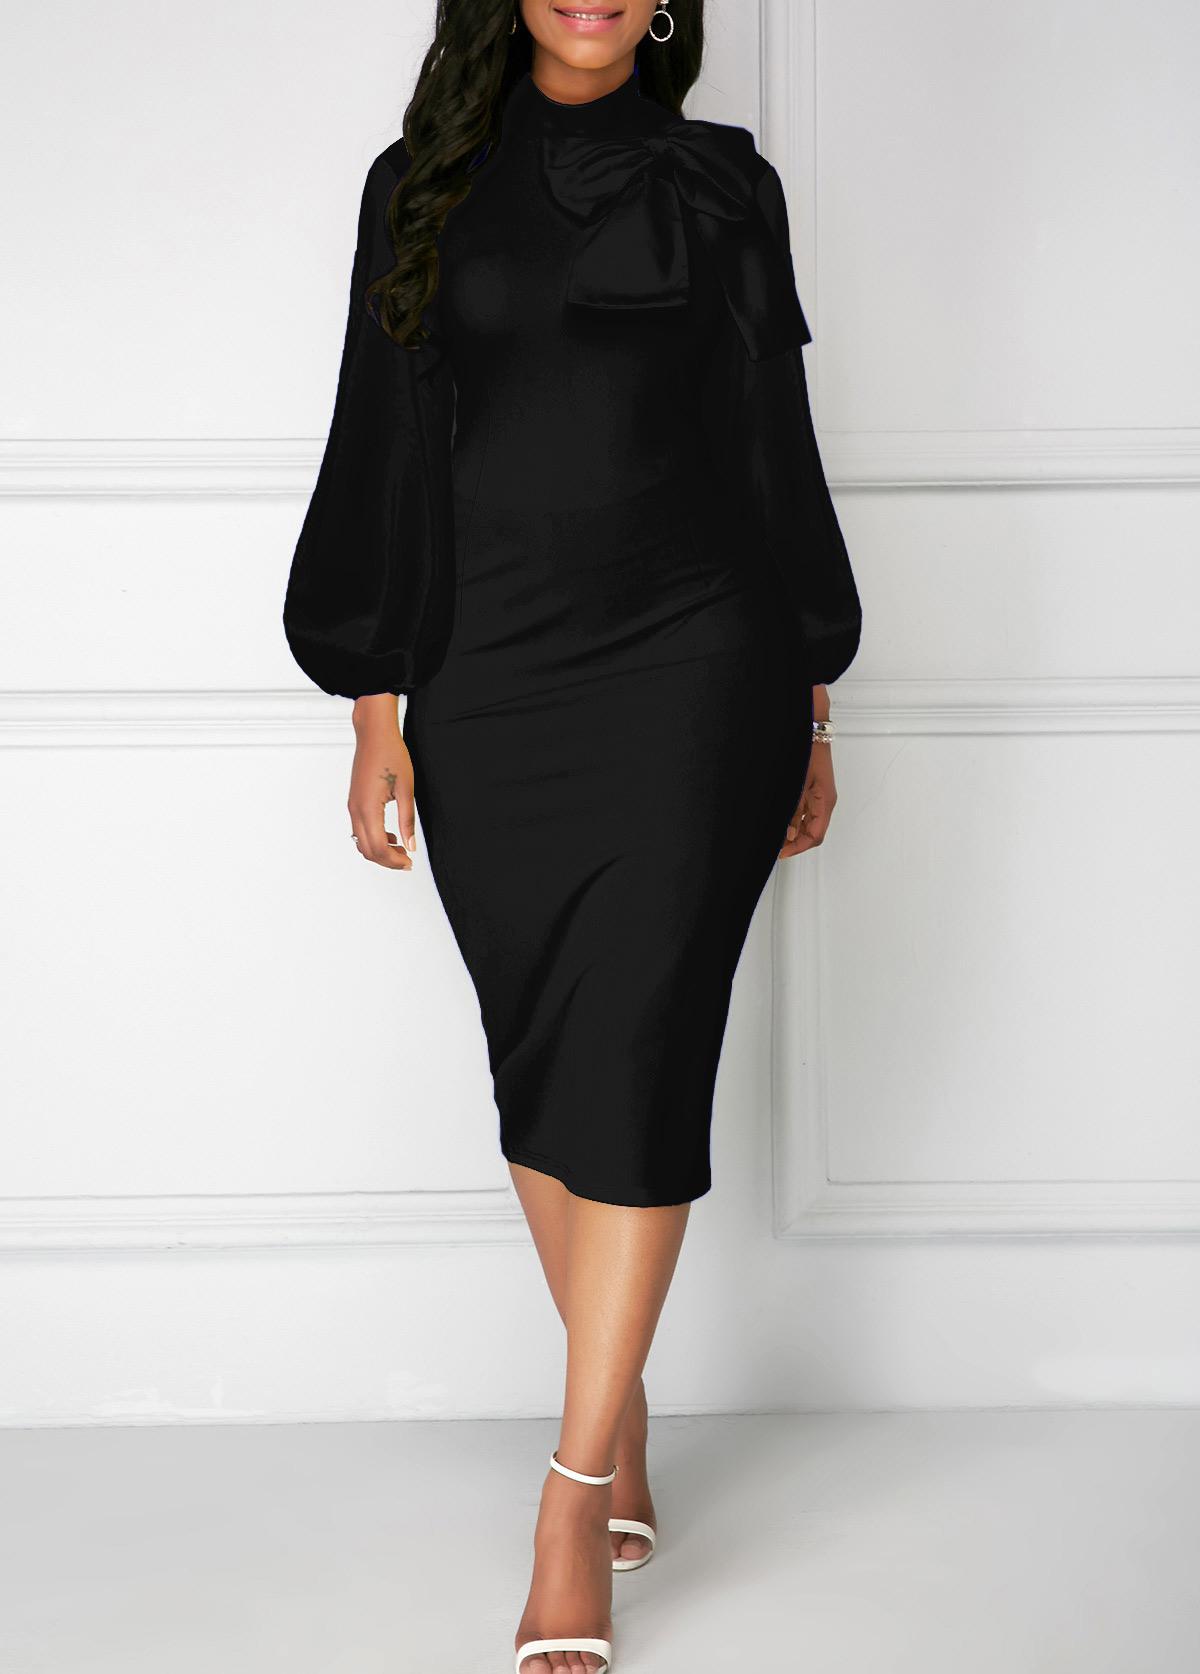 ROTITA Bowknot Neck Lantern Sleeve Black Sheath Dress